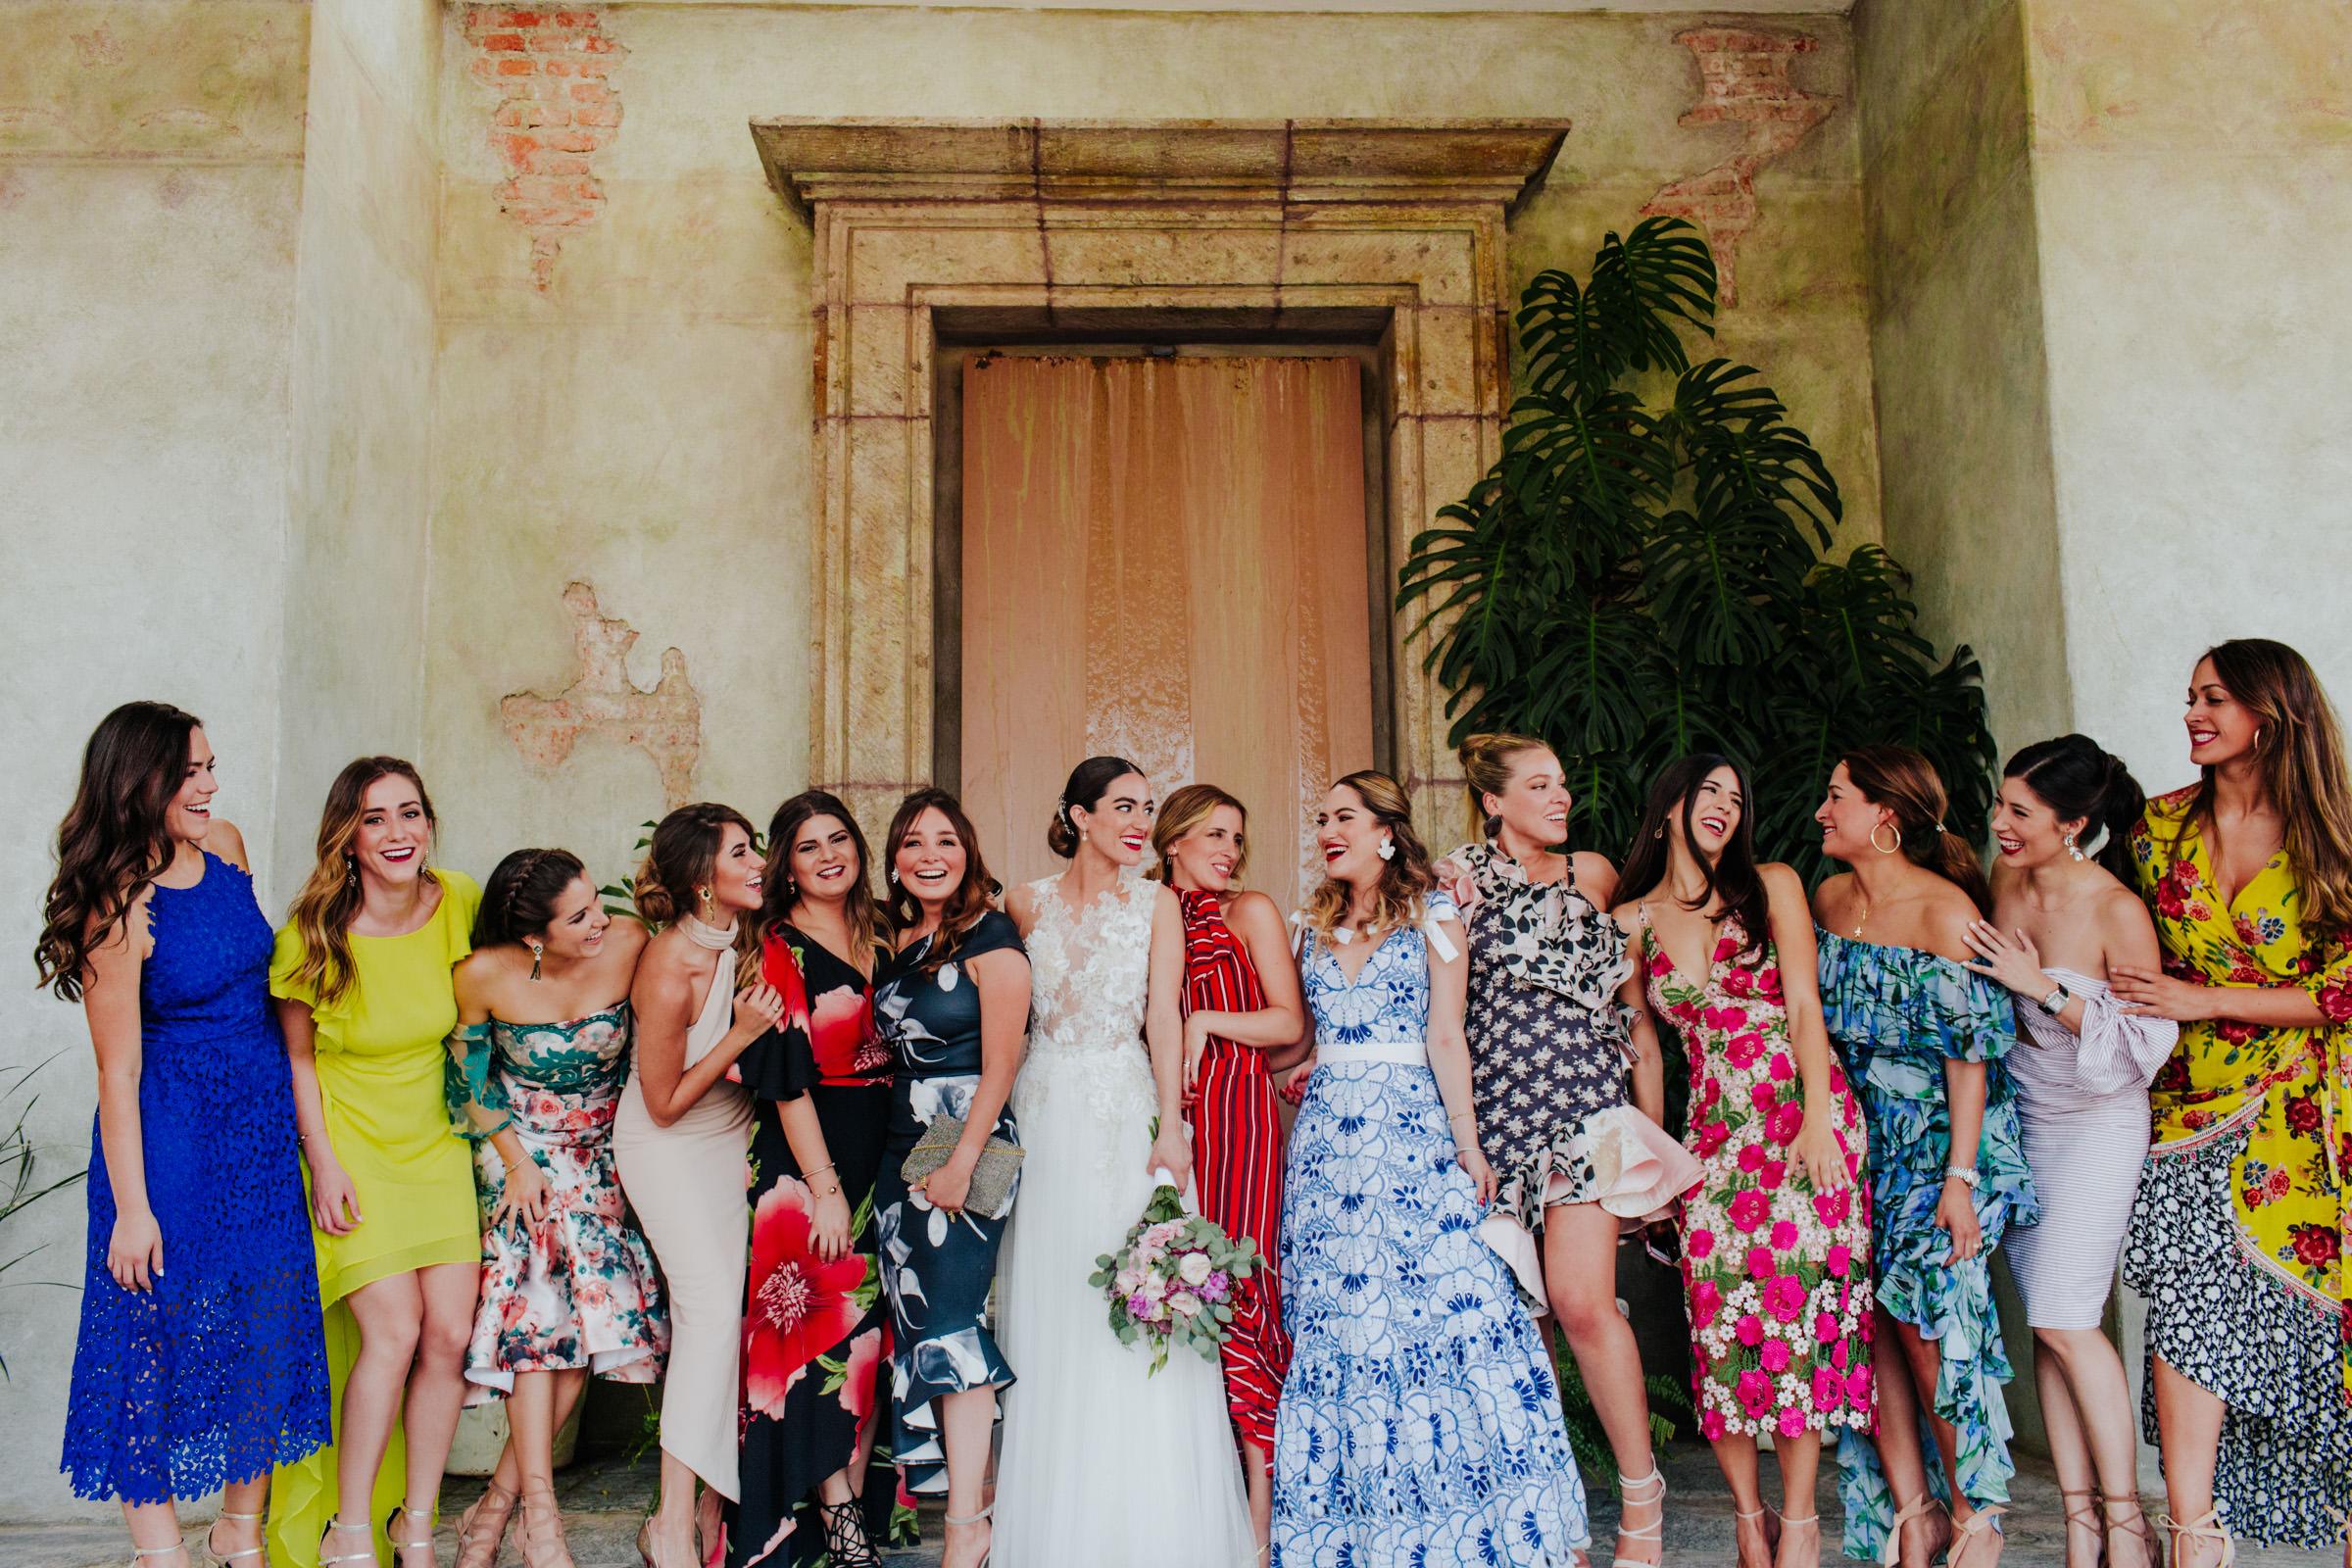 San-Miguel-de-Allende-Wedding-Photography-Parroquia-Instituto-Boda-Fotografia-Fer-Sergio-Pierce-Lifestyle-Photography0311.JPG